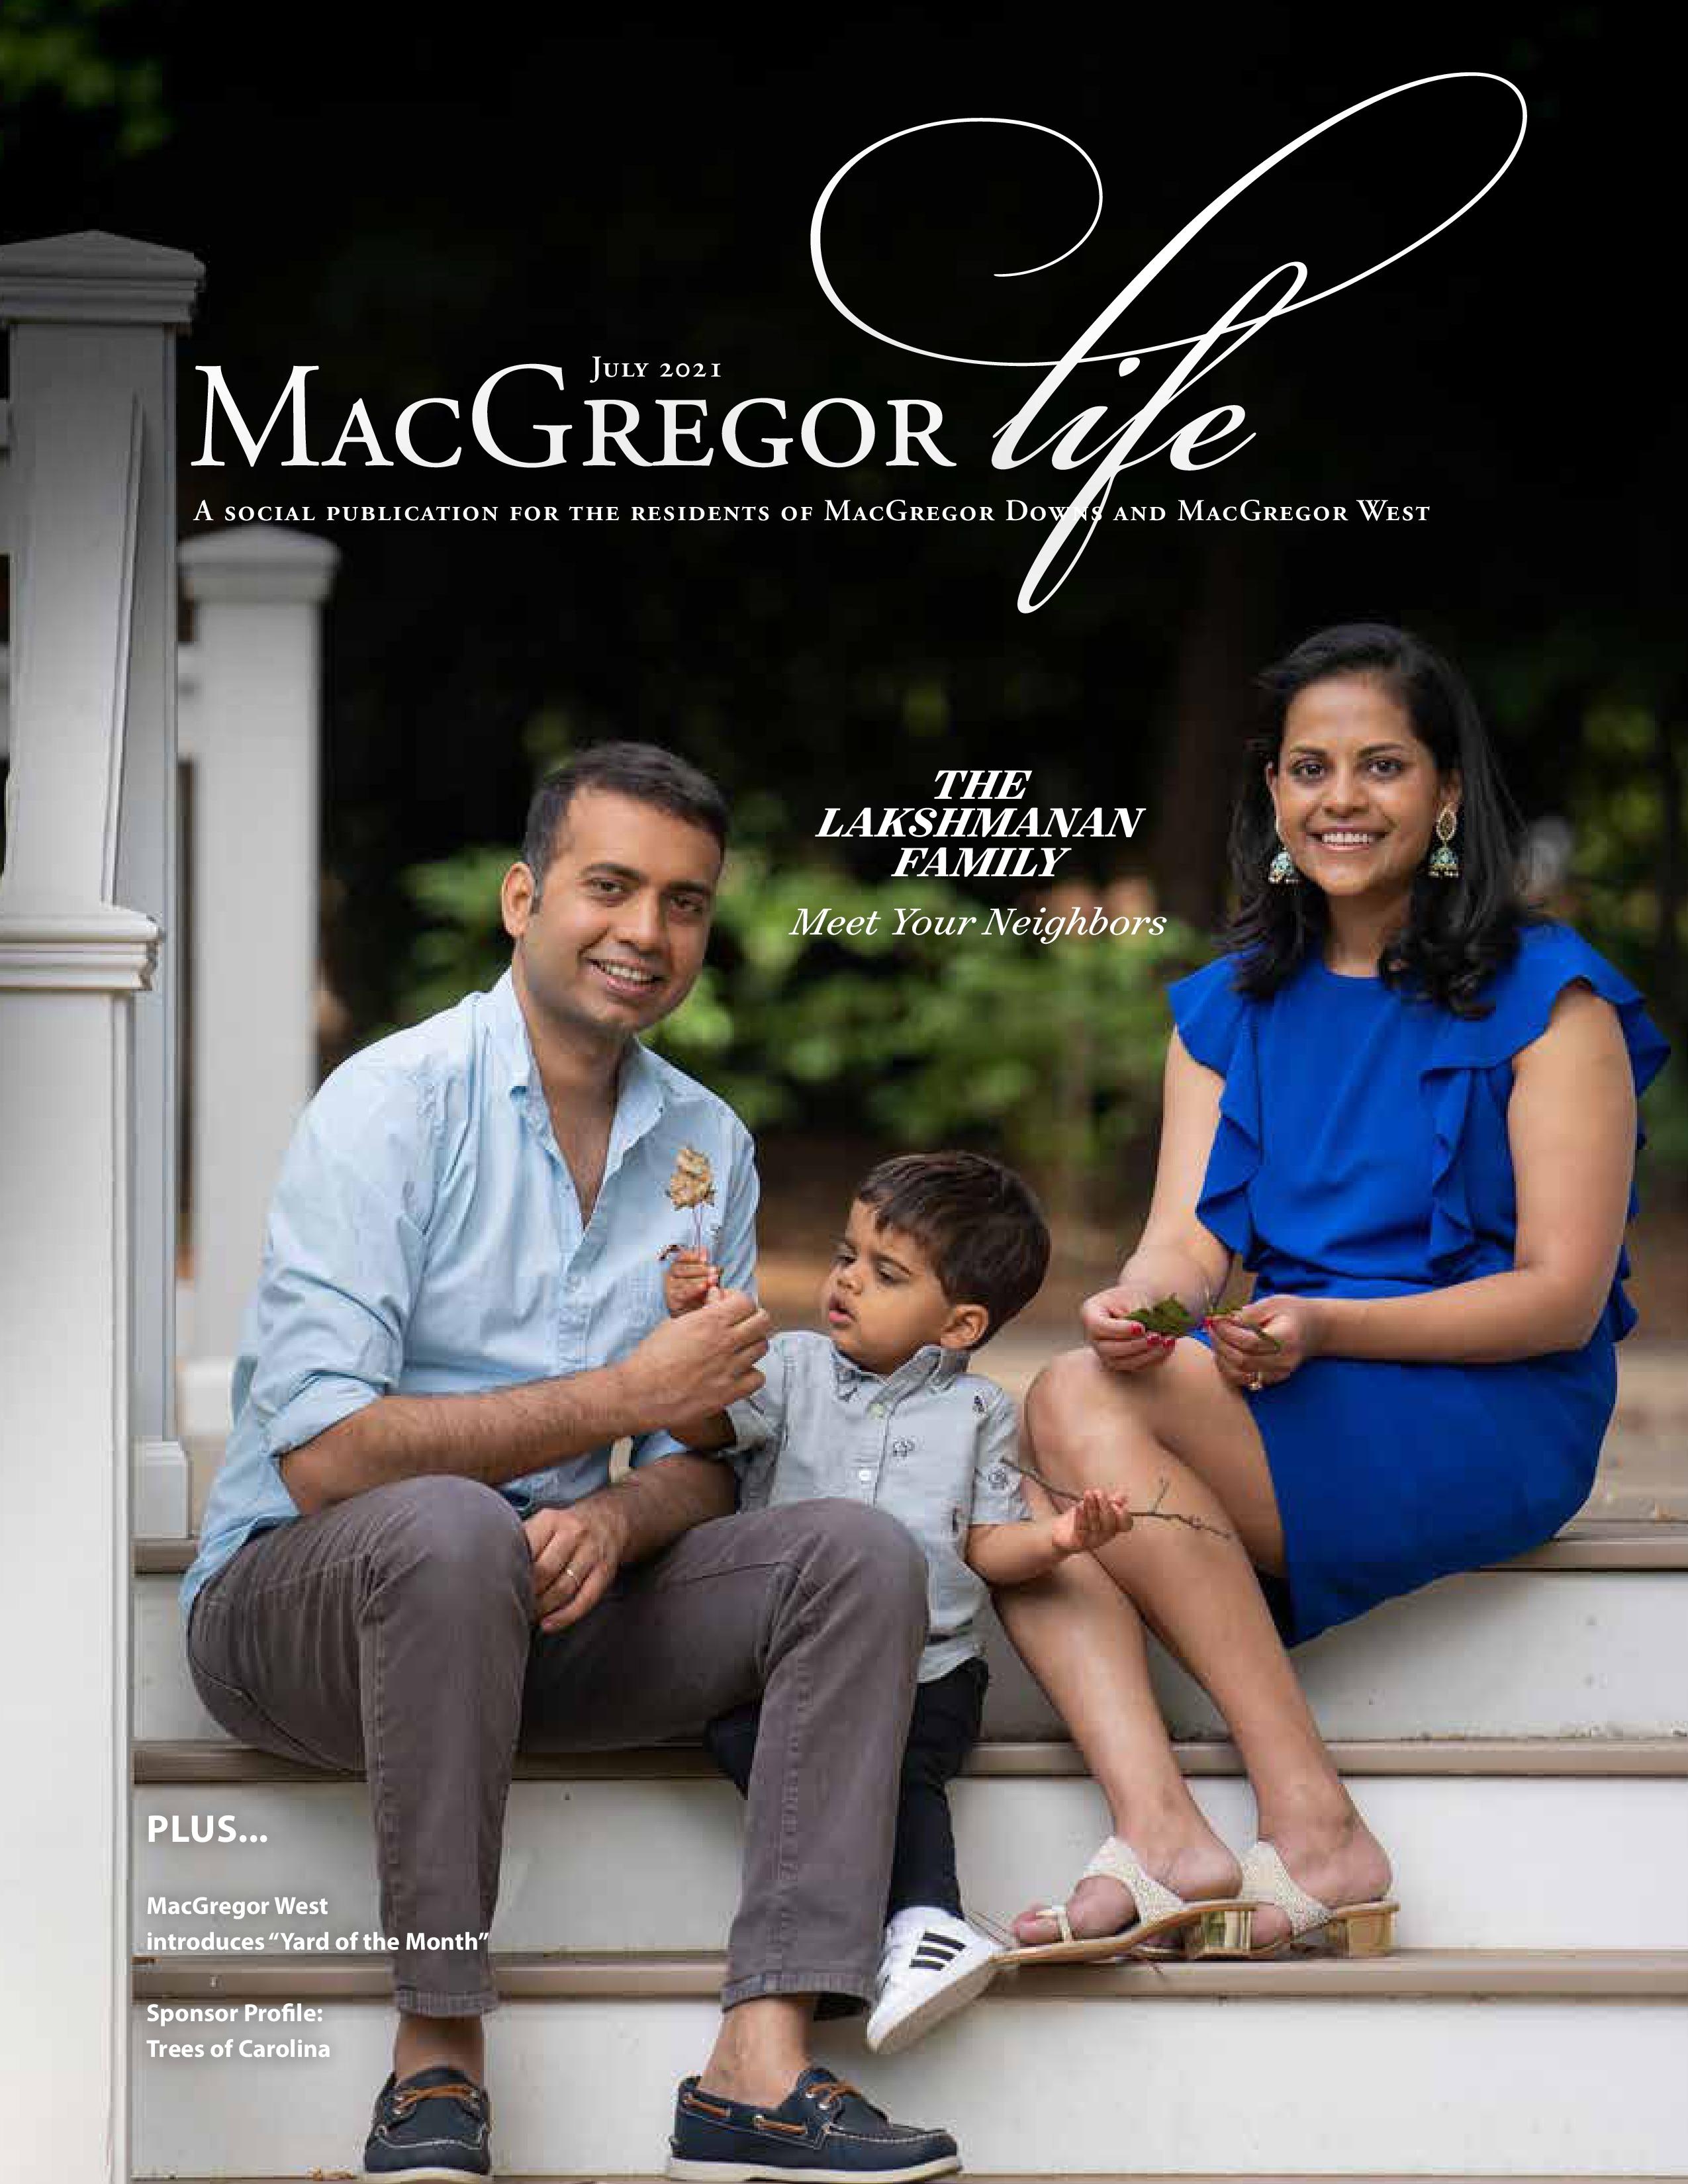 Macgregor Life 2021-07-01